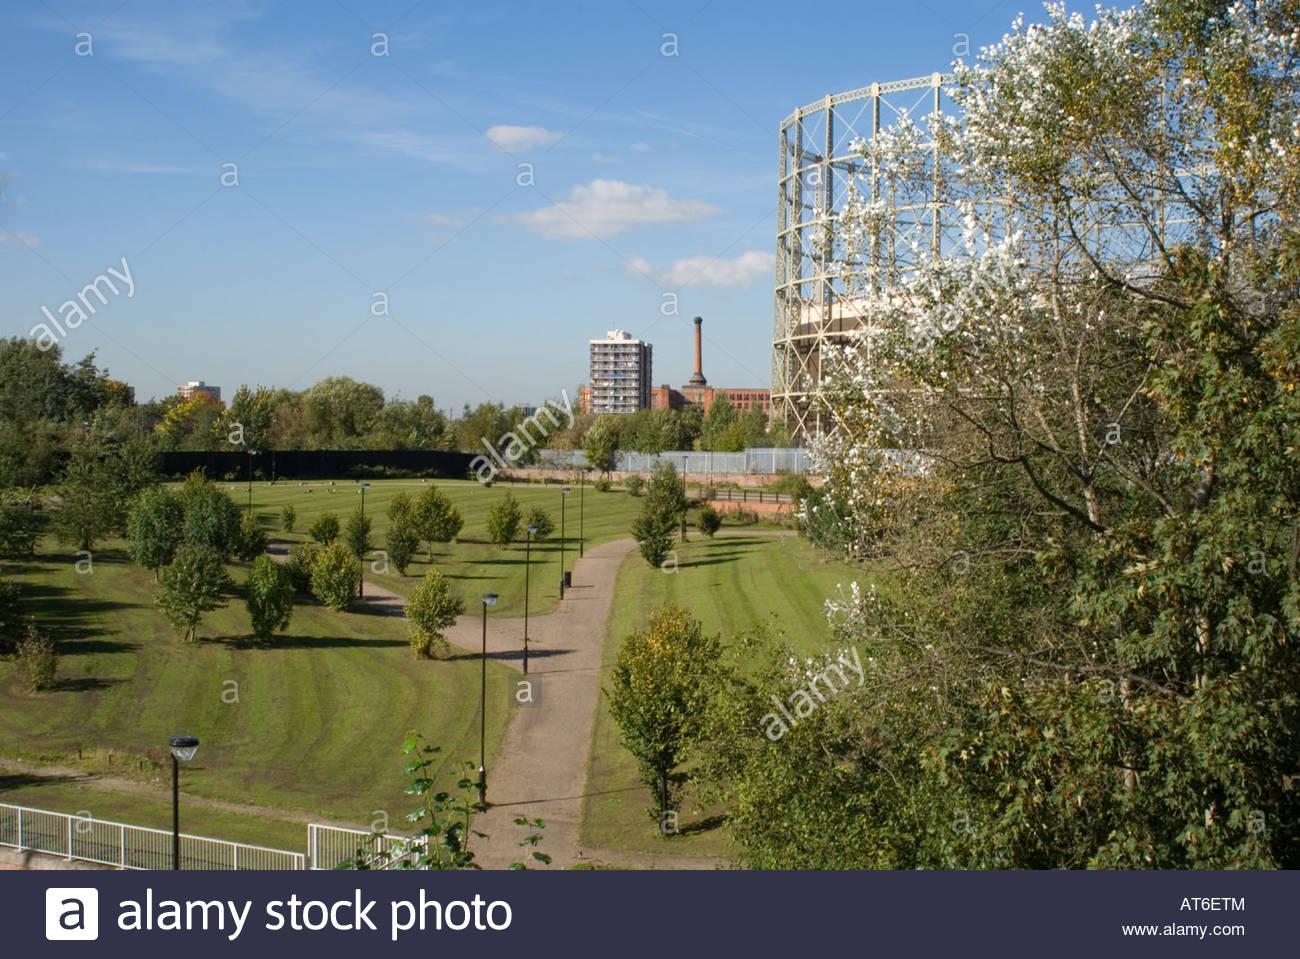 Parkland close to Eastlands, East Manchester UK - Stock Image